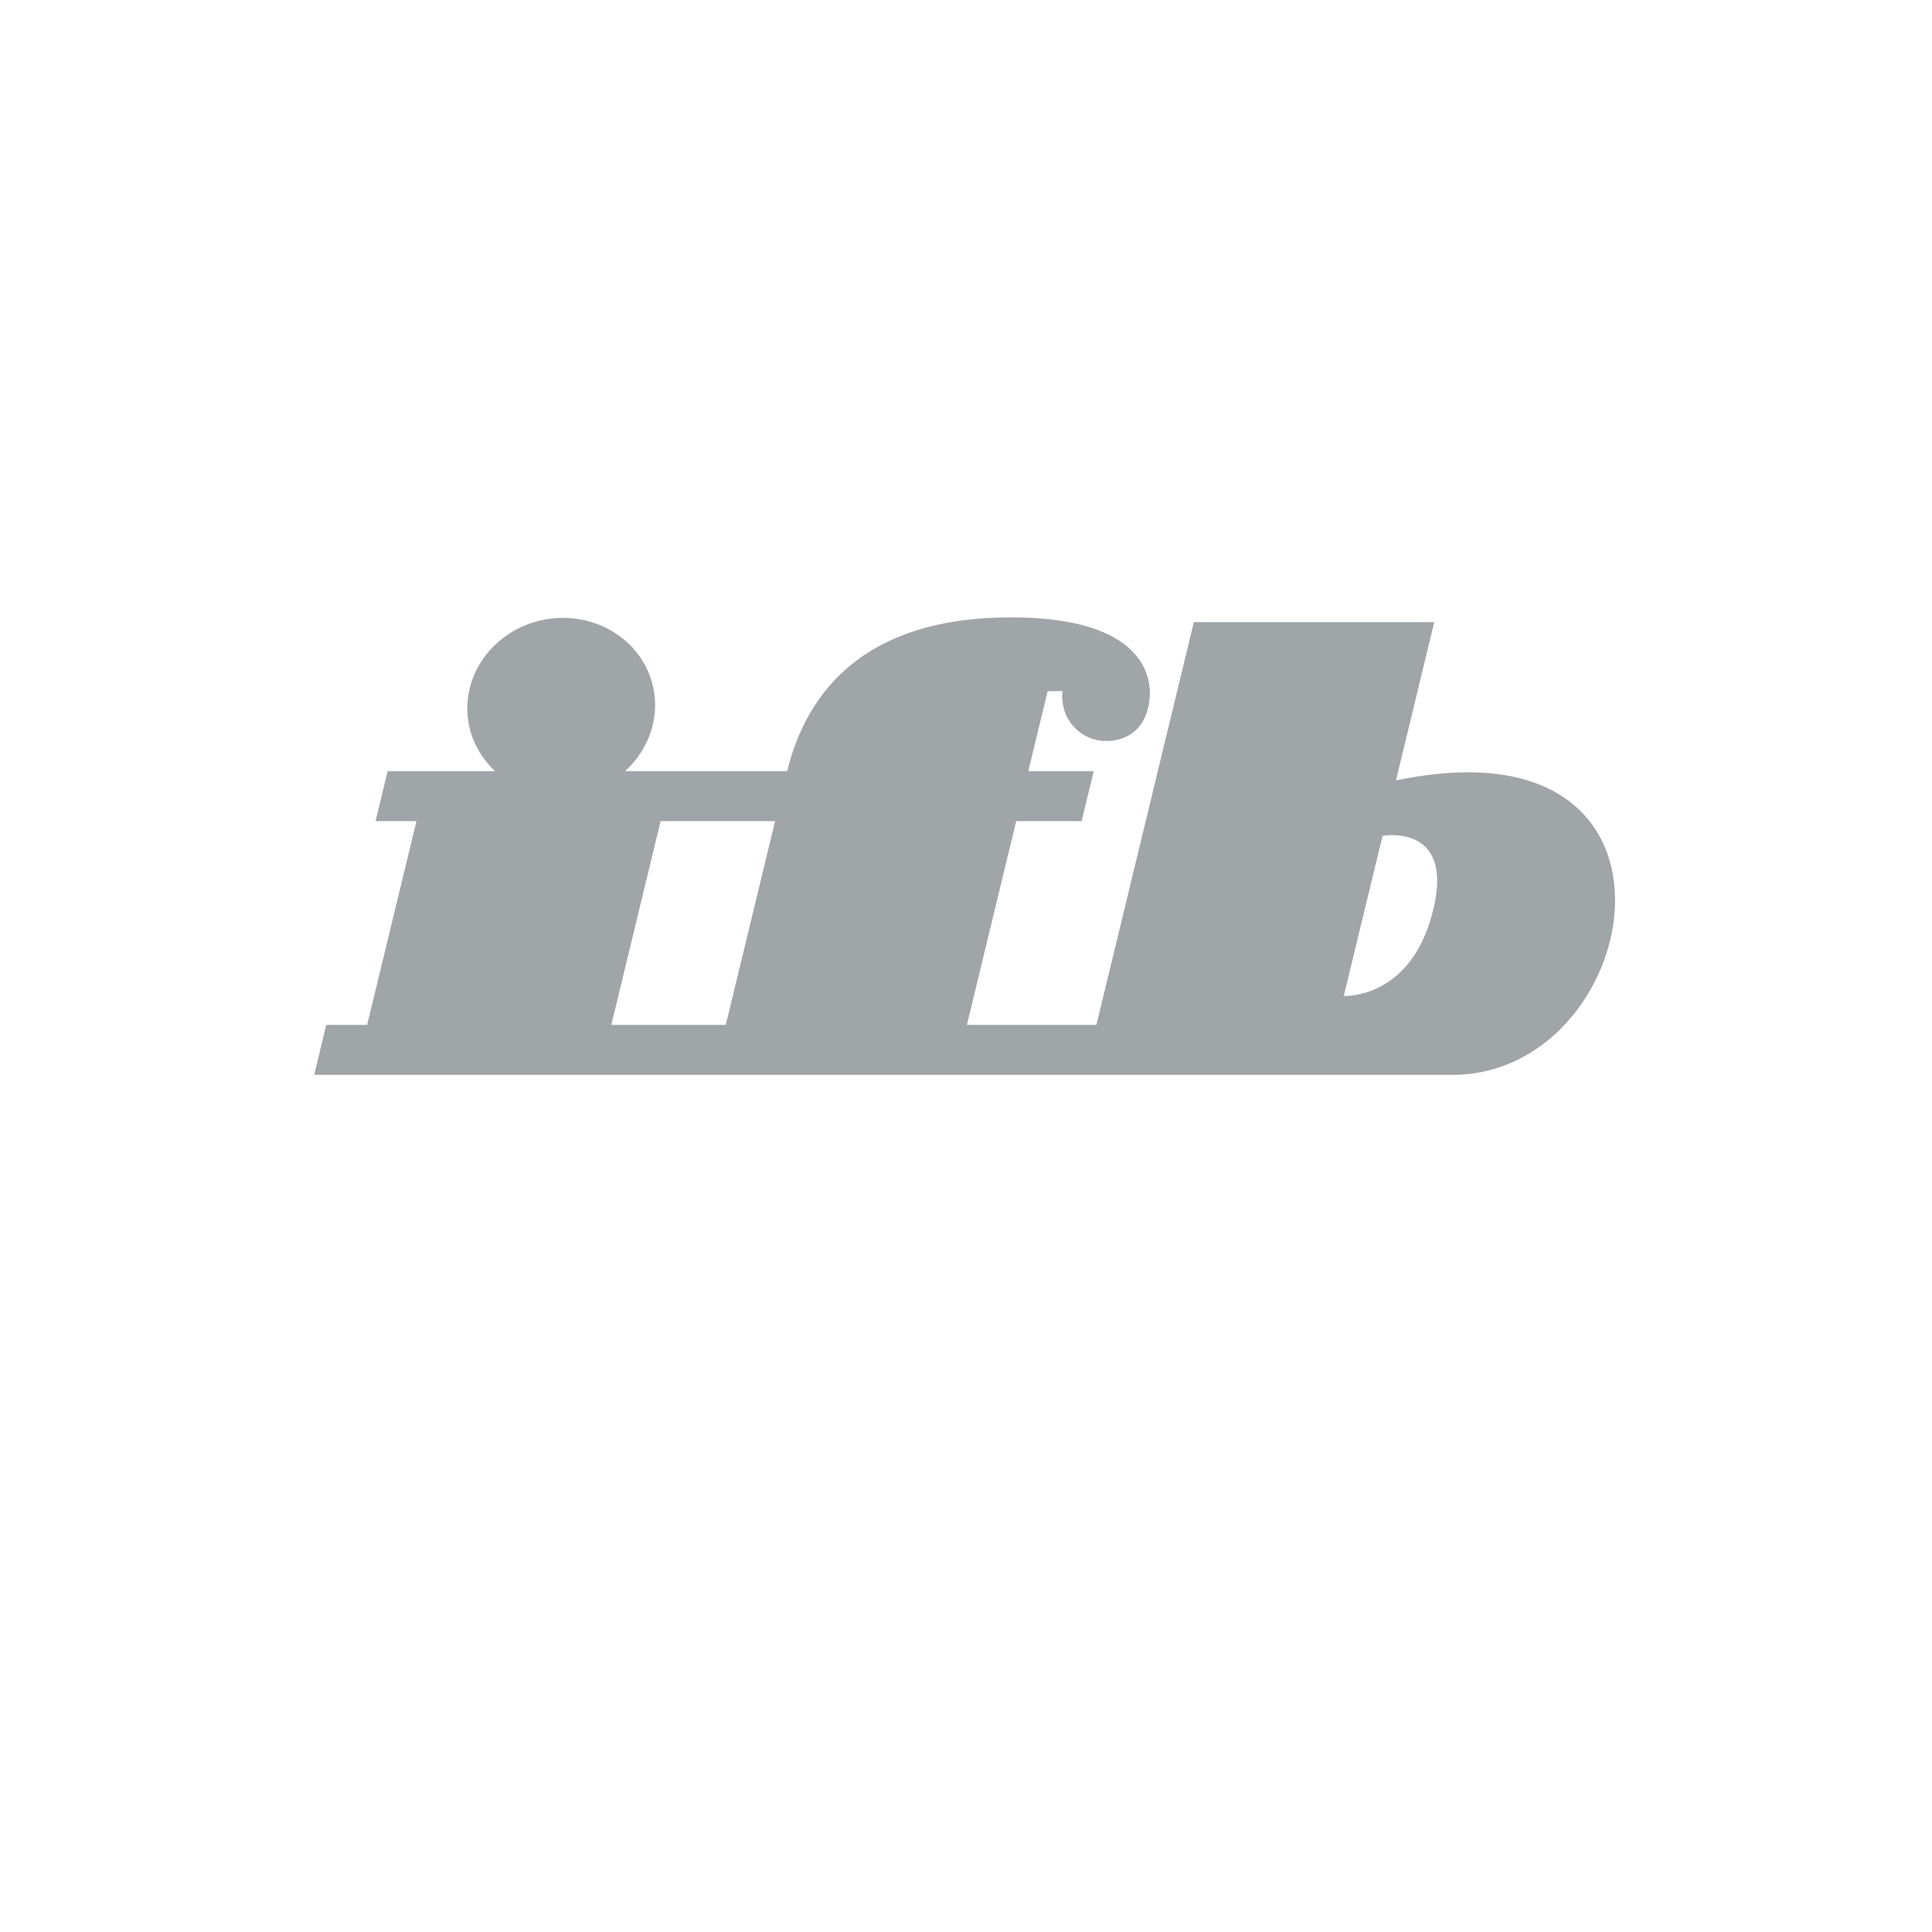 ifb_20151501.jpg